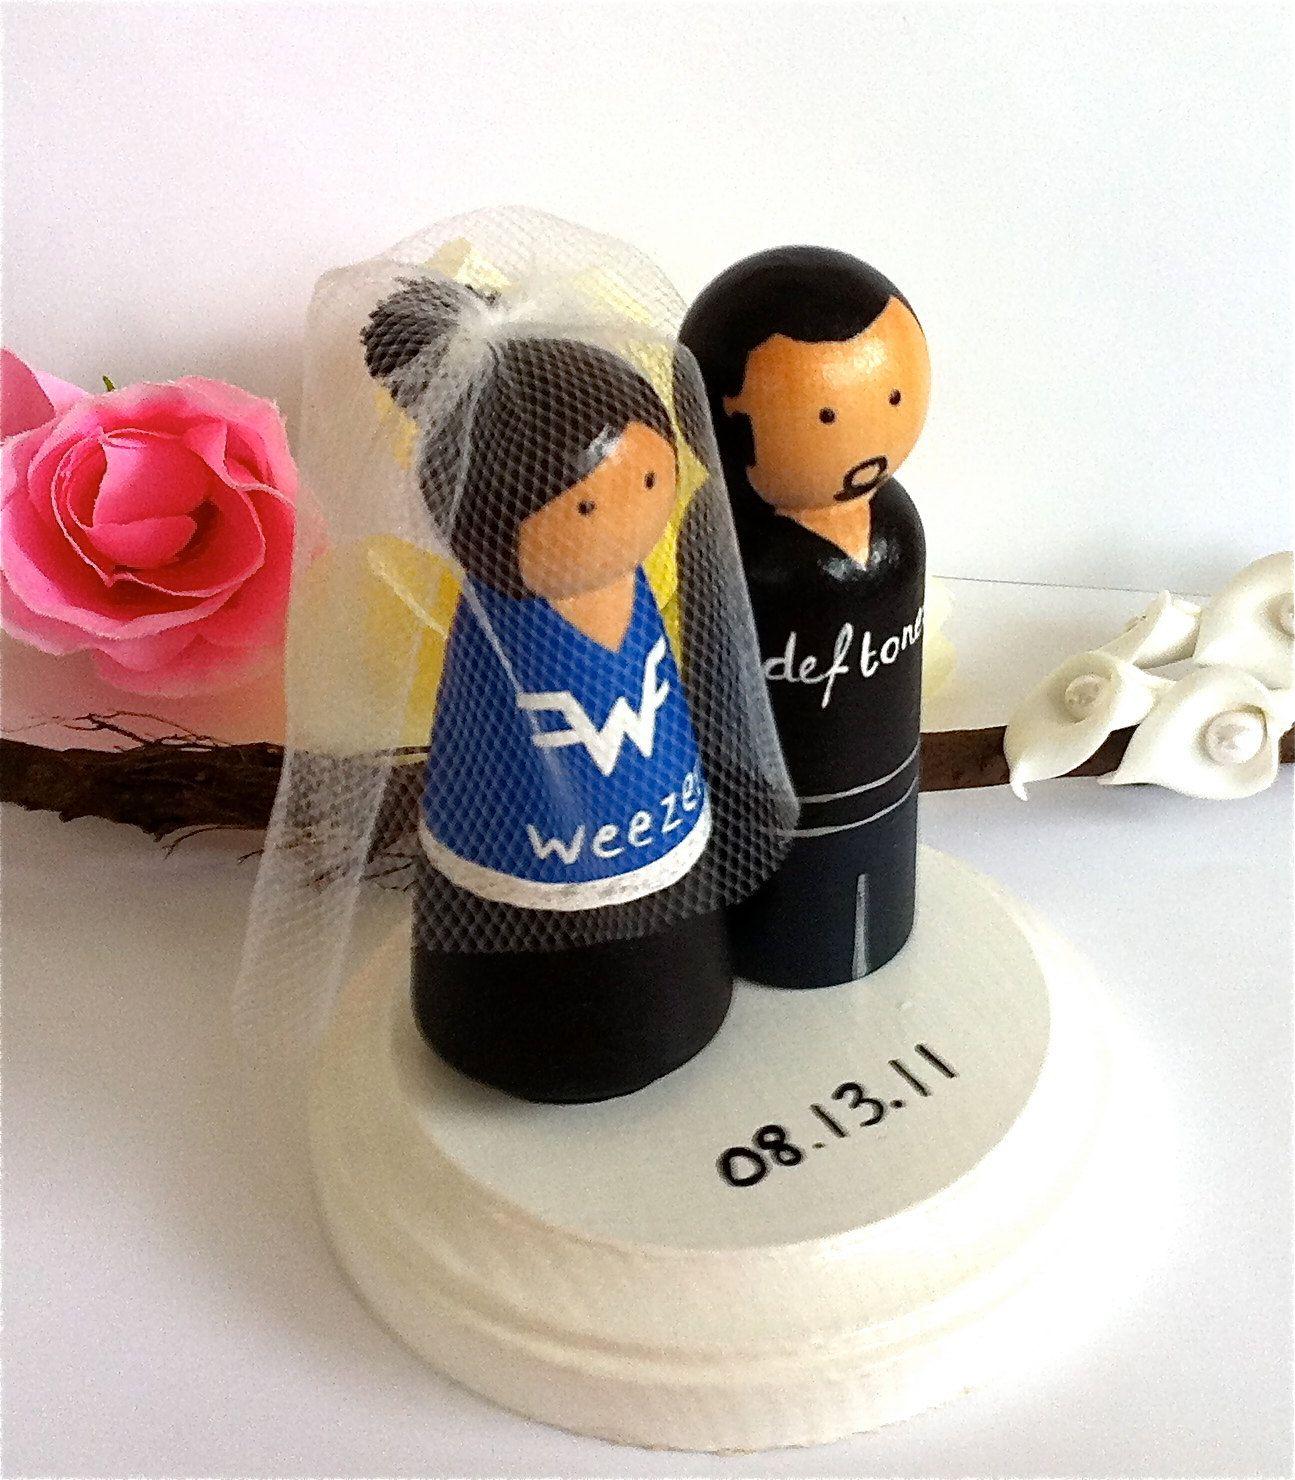 Rocker Wedding Cake Toppers Rock Star Bride Groom Music Deftones Beatles Punk Rock N Roll Rap T Shirts Wood Peg Dolls Personalized Keepsake. $70,00, via Etsy.